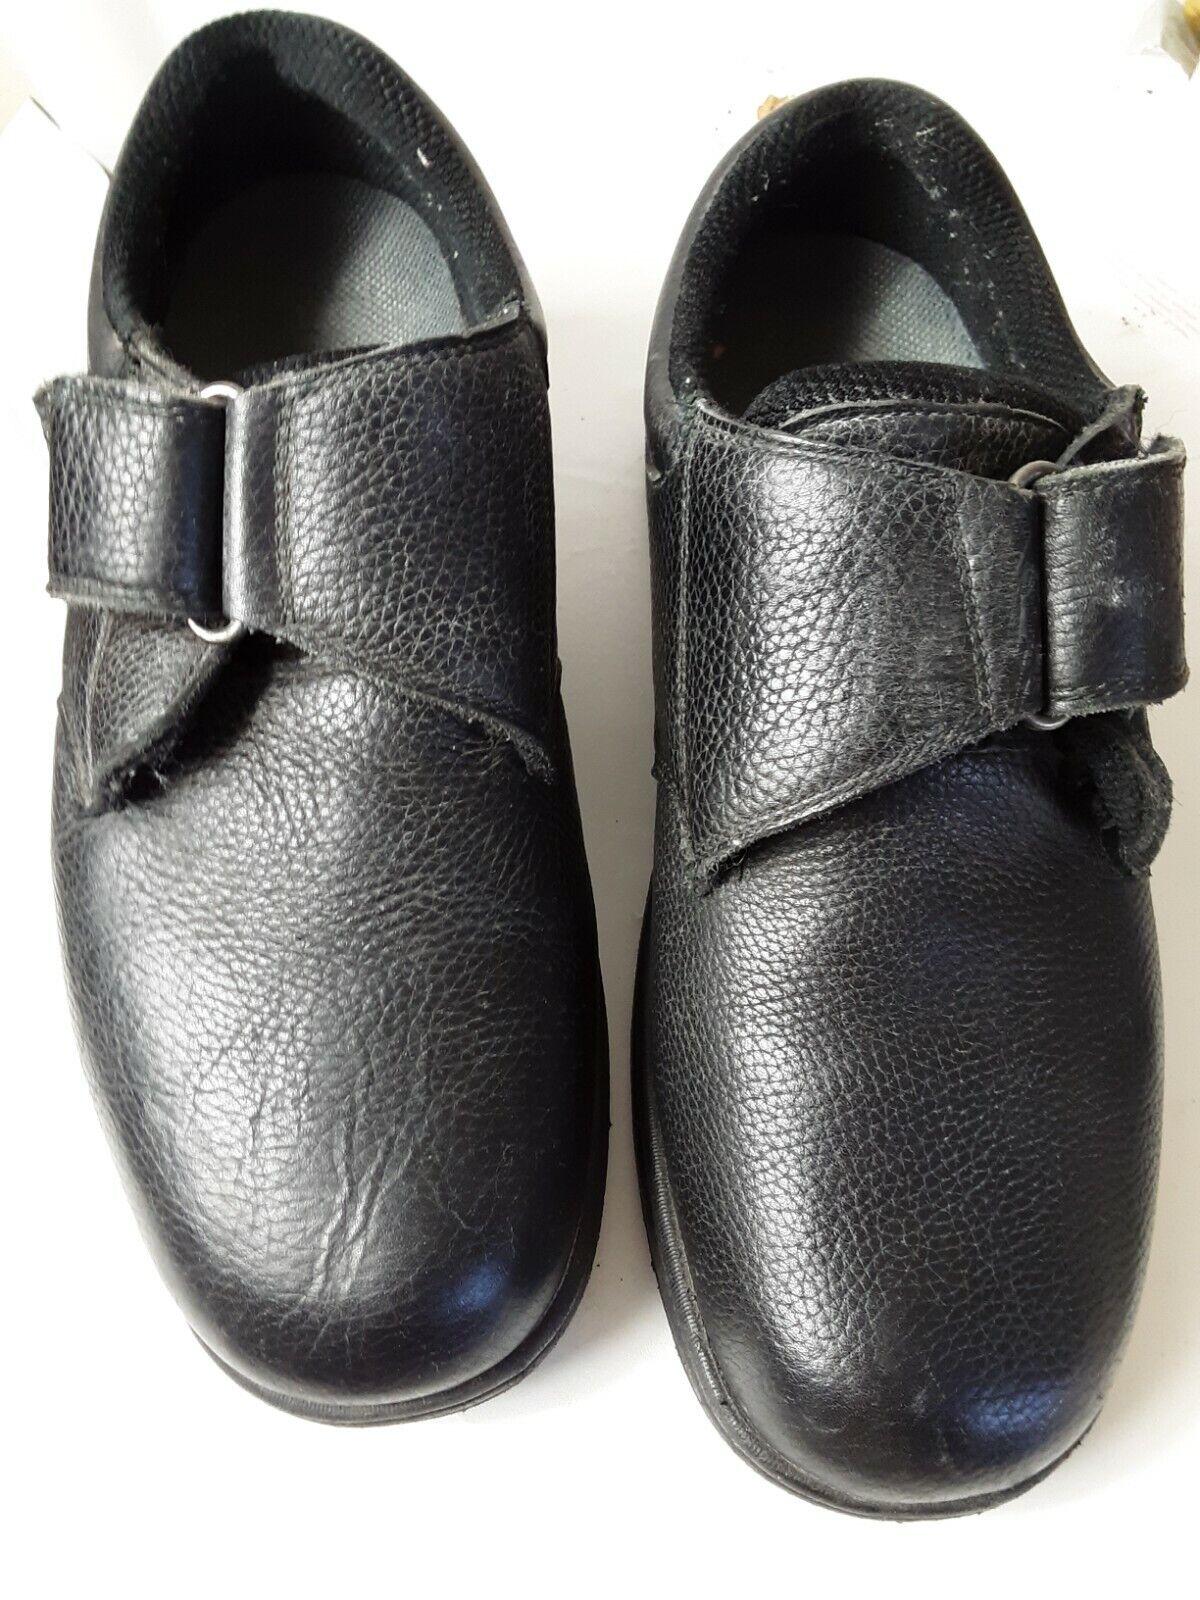 Orthofeet 510 Broadway Mens 12 B NARROW Black Leather Hook Loop Shoes Orthopedic